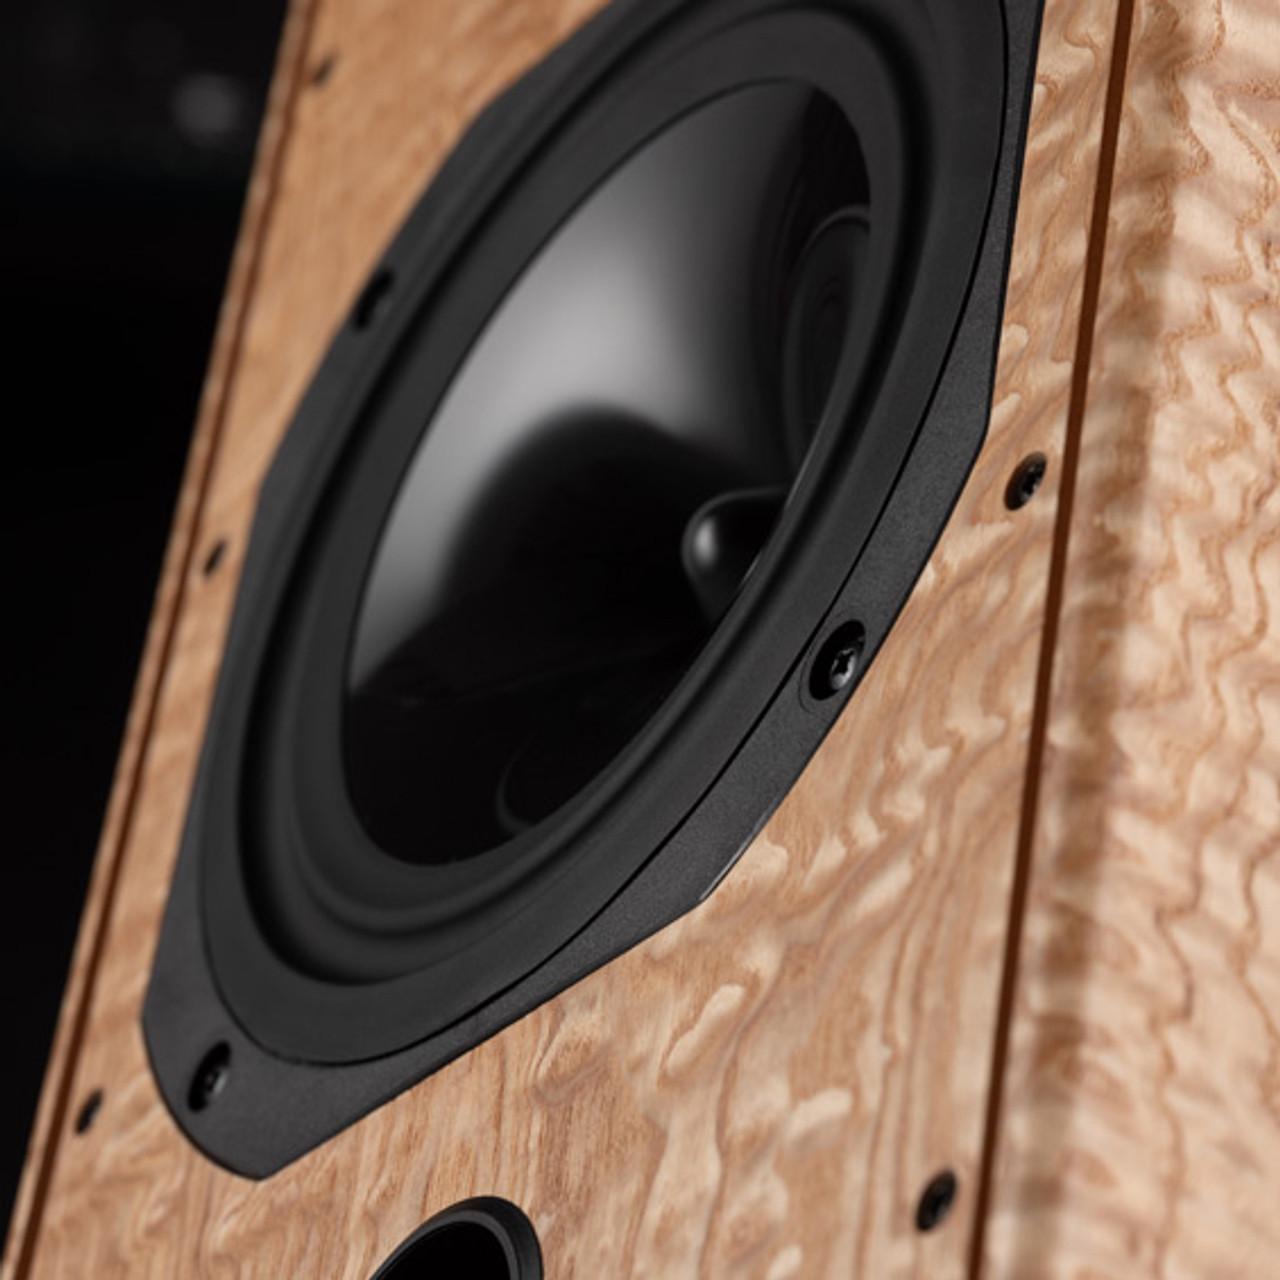 Harbeth HL-Compact 7ES-3 Anniversary speakers